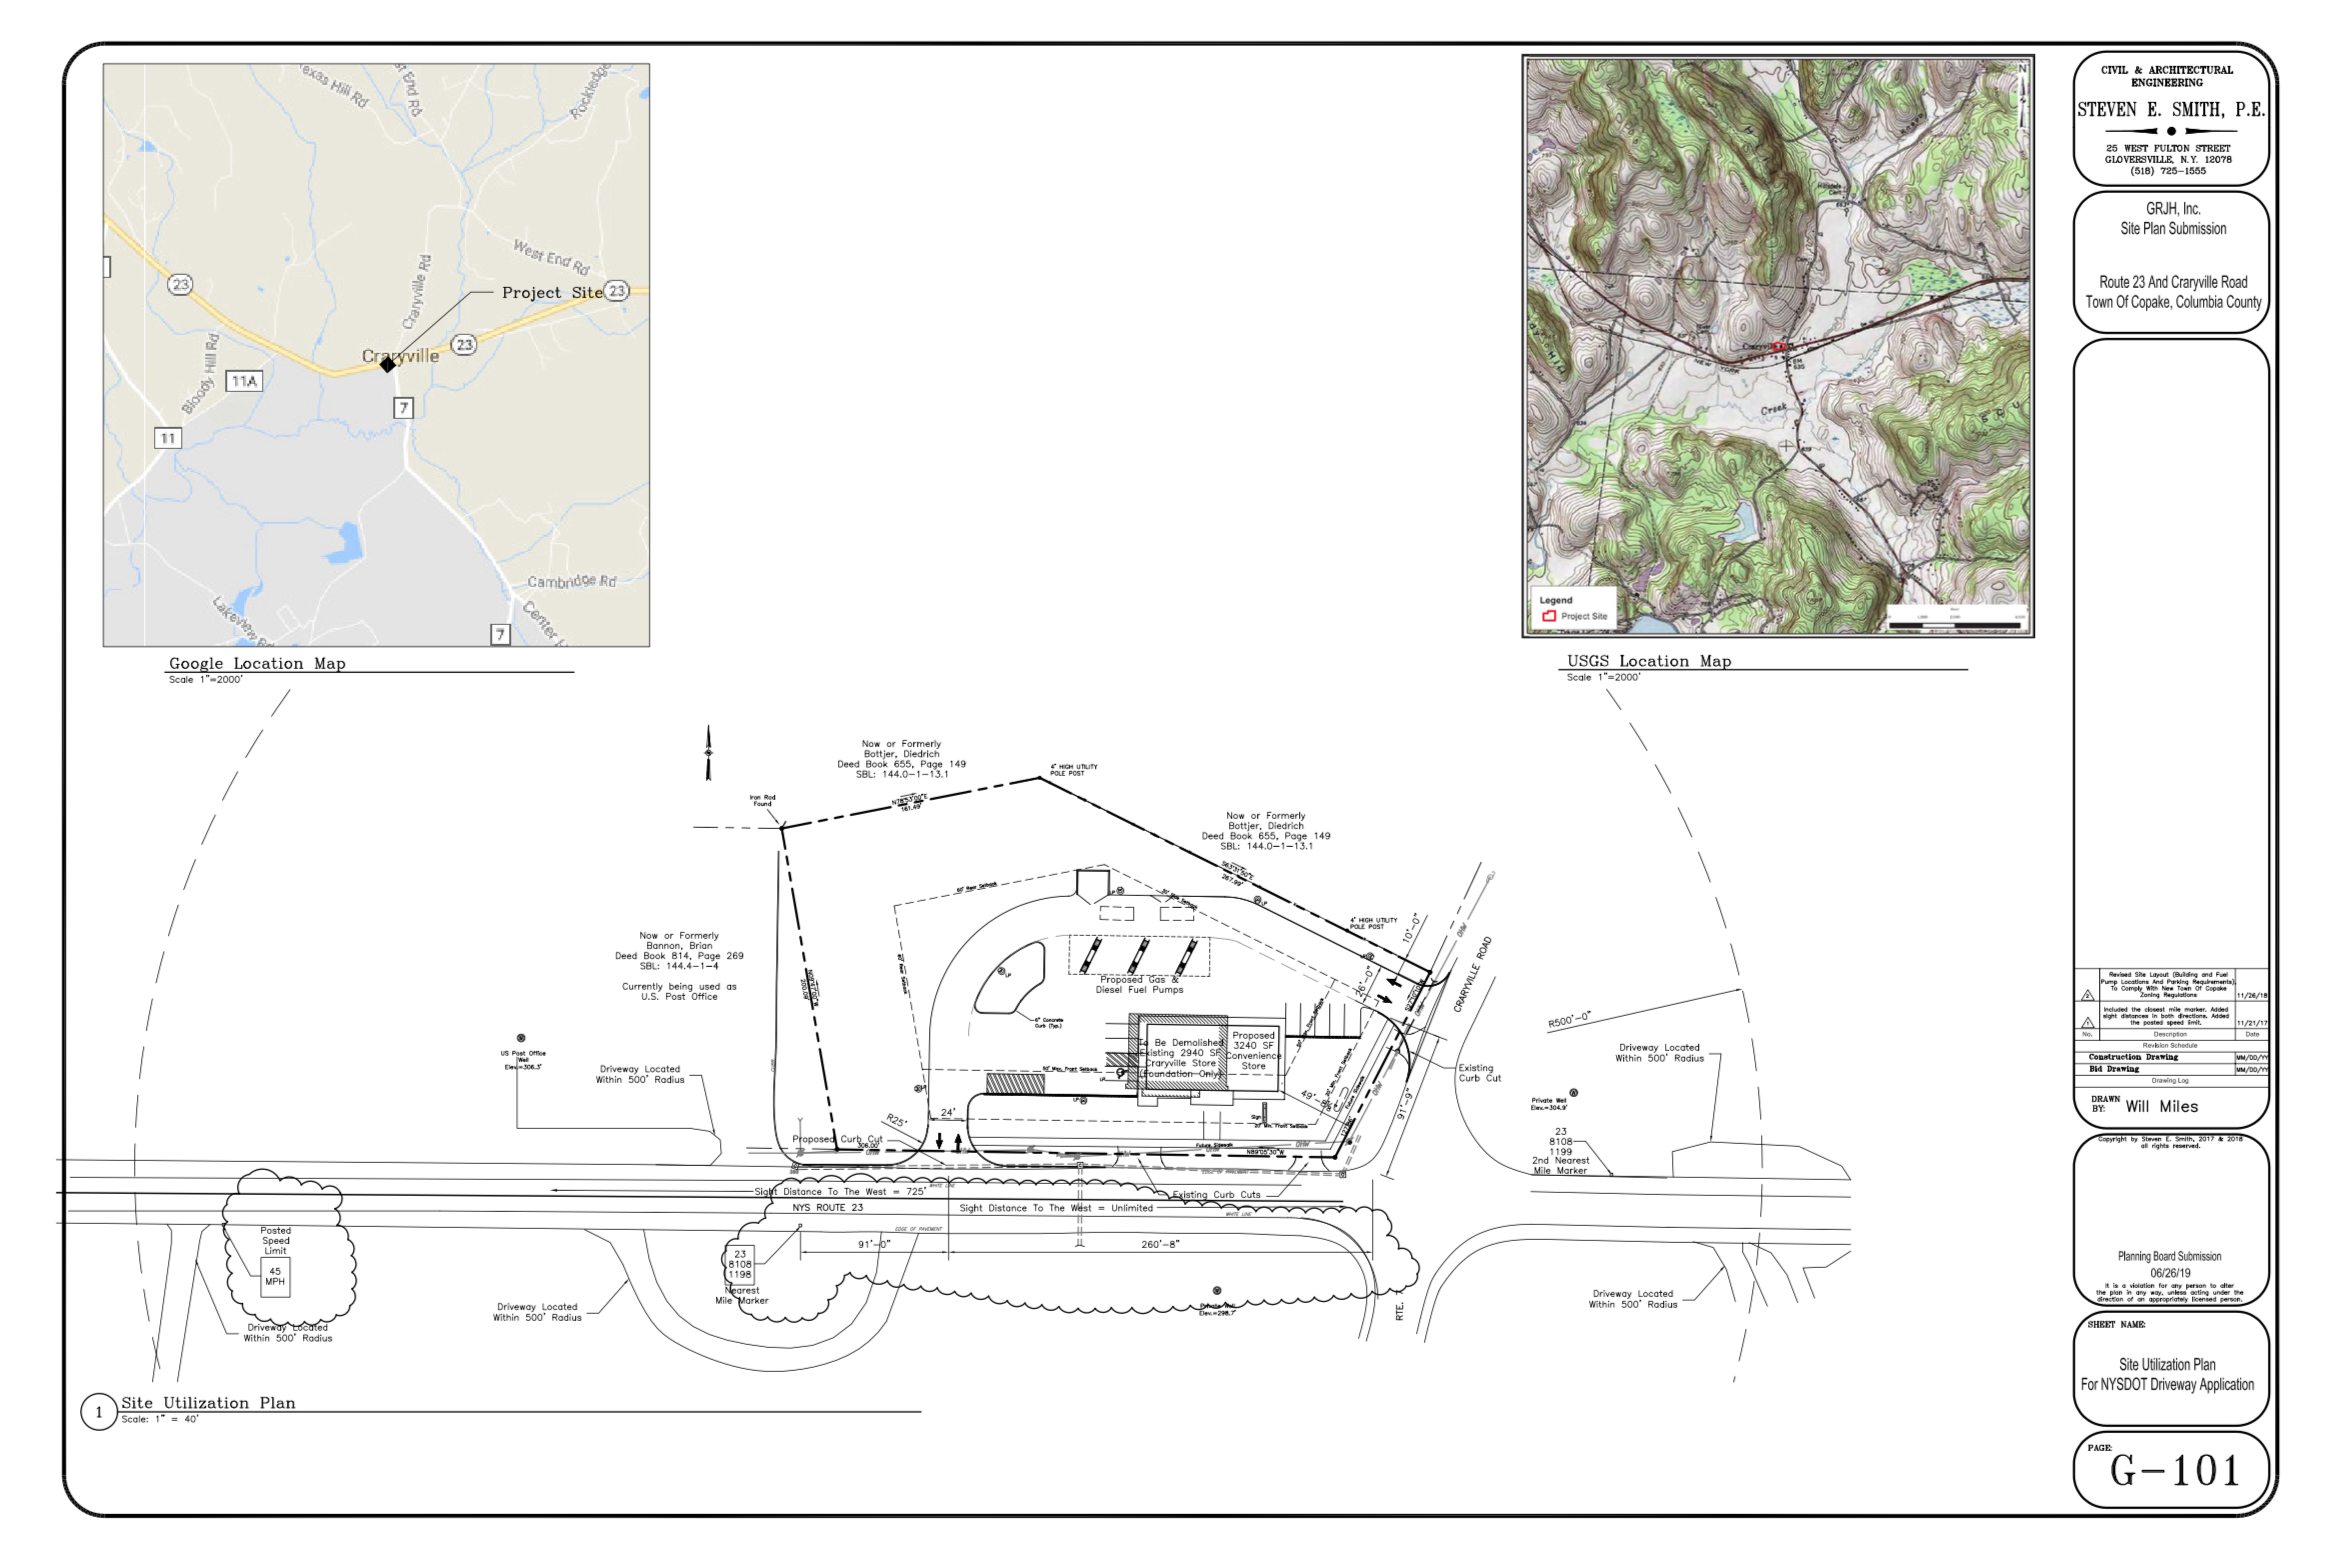 Site Plans GRJH Cobble Pond Gas Station_02.jpg